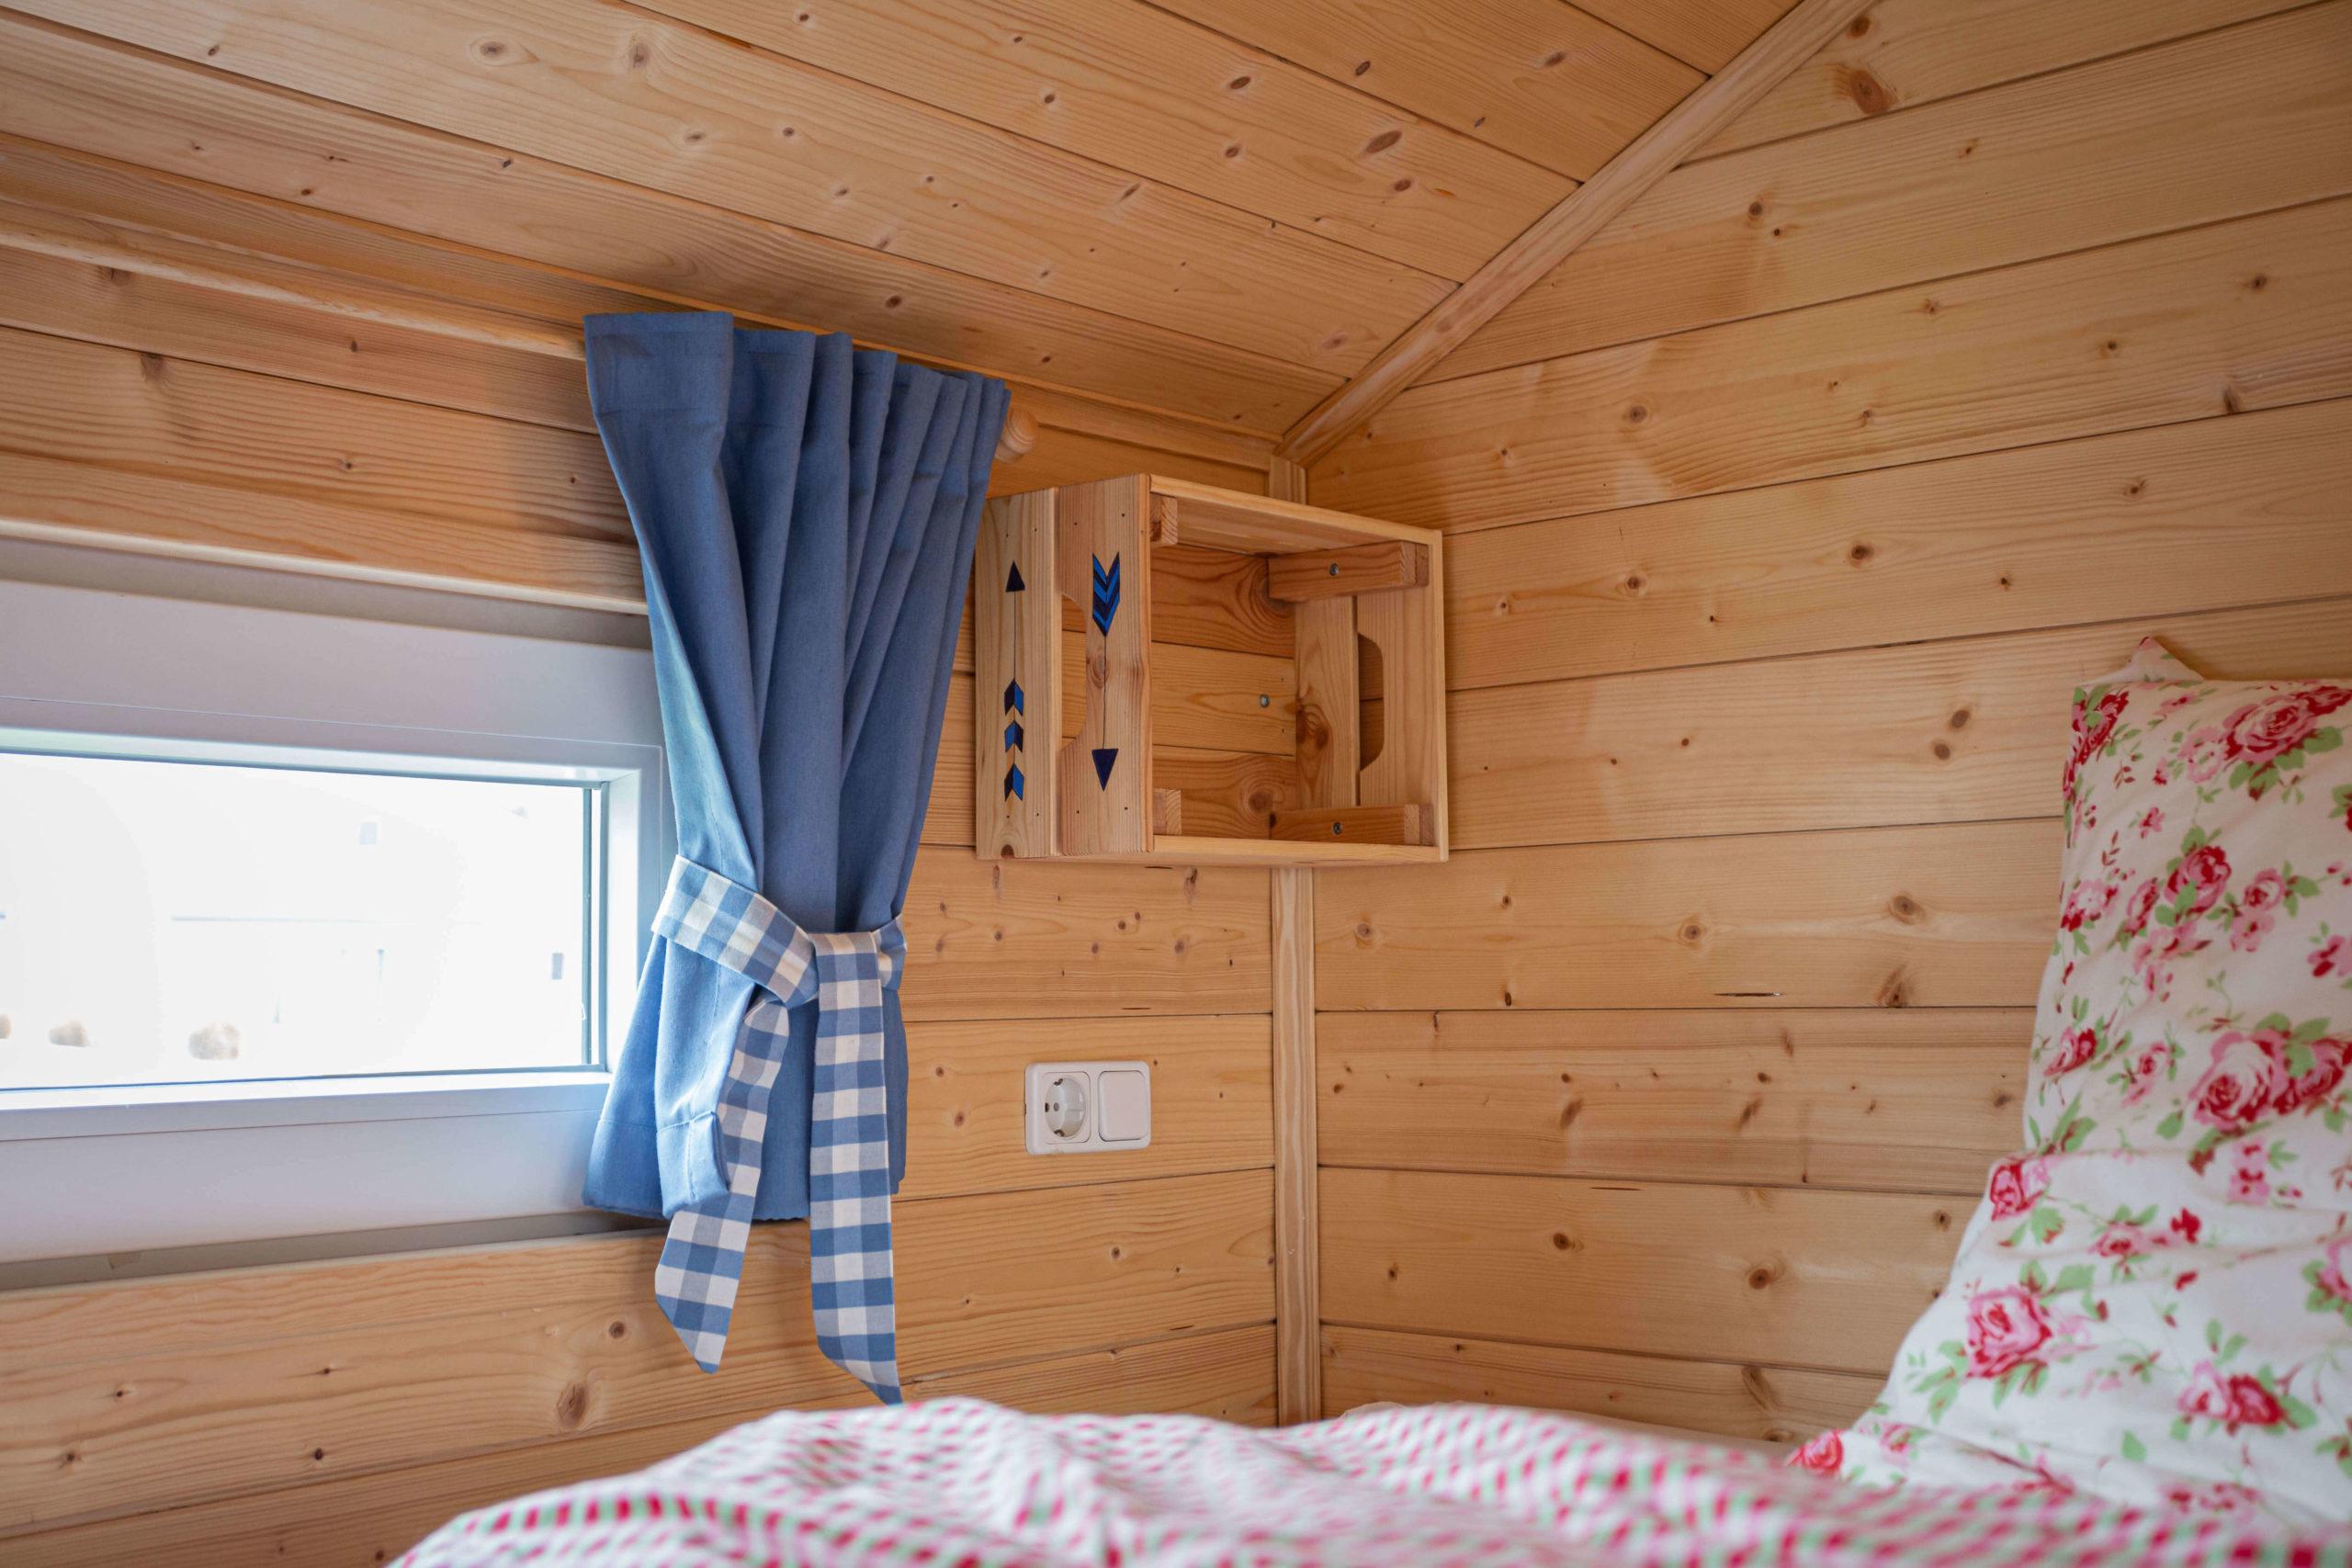 mobiles-tiny-house-island-vital-camp-gmbh-32